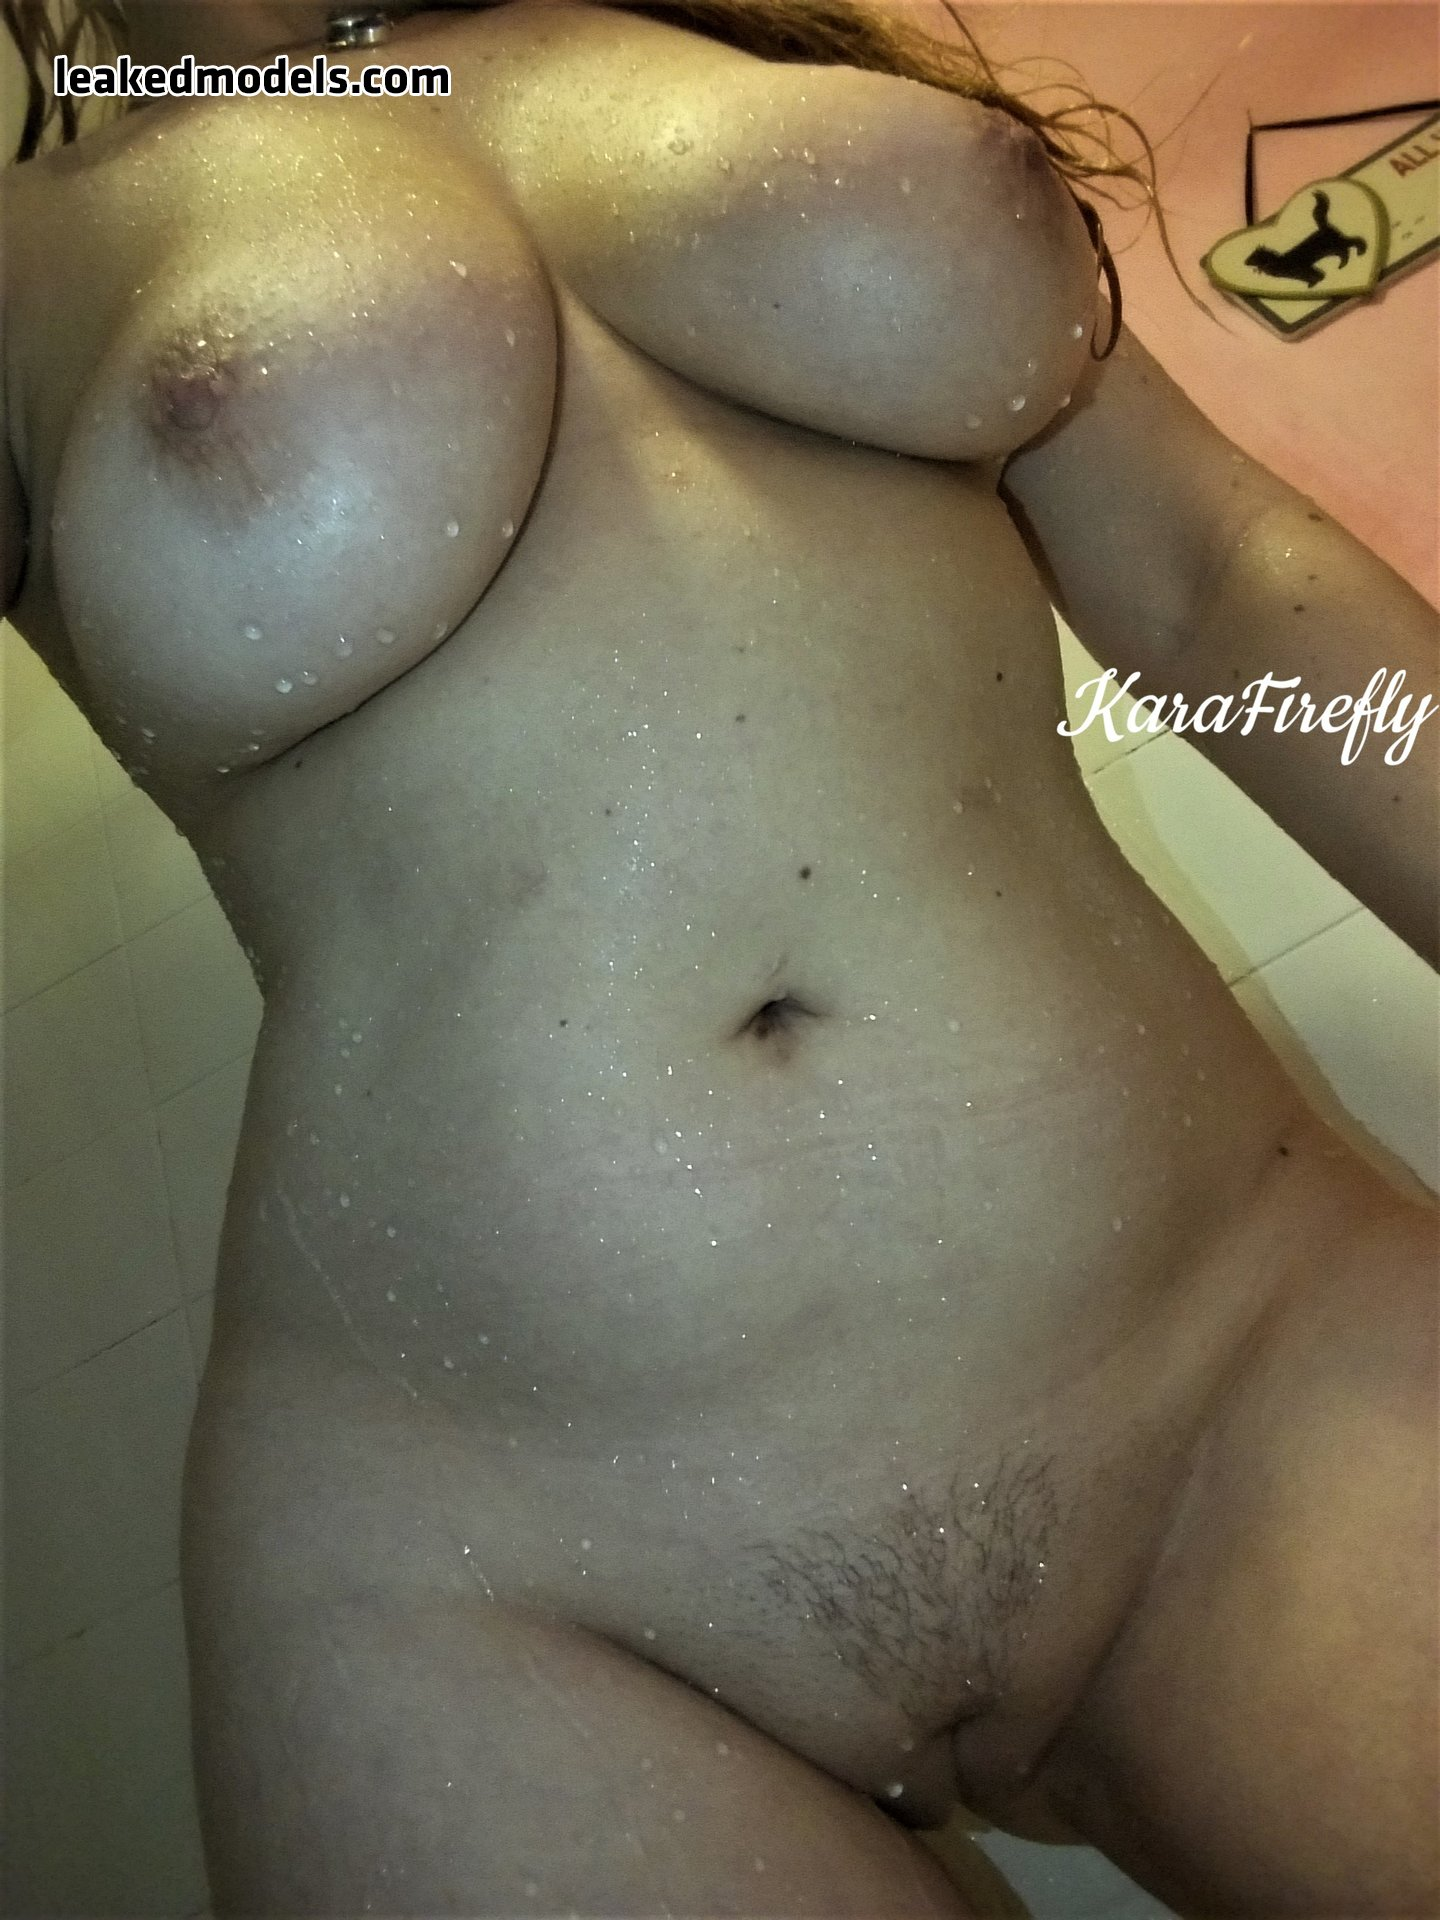 KaraFirefly OnlyFans Nude Leaks (30 Photos)